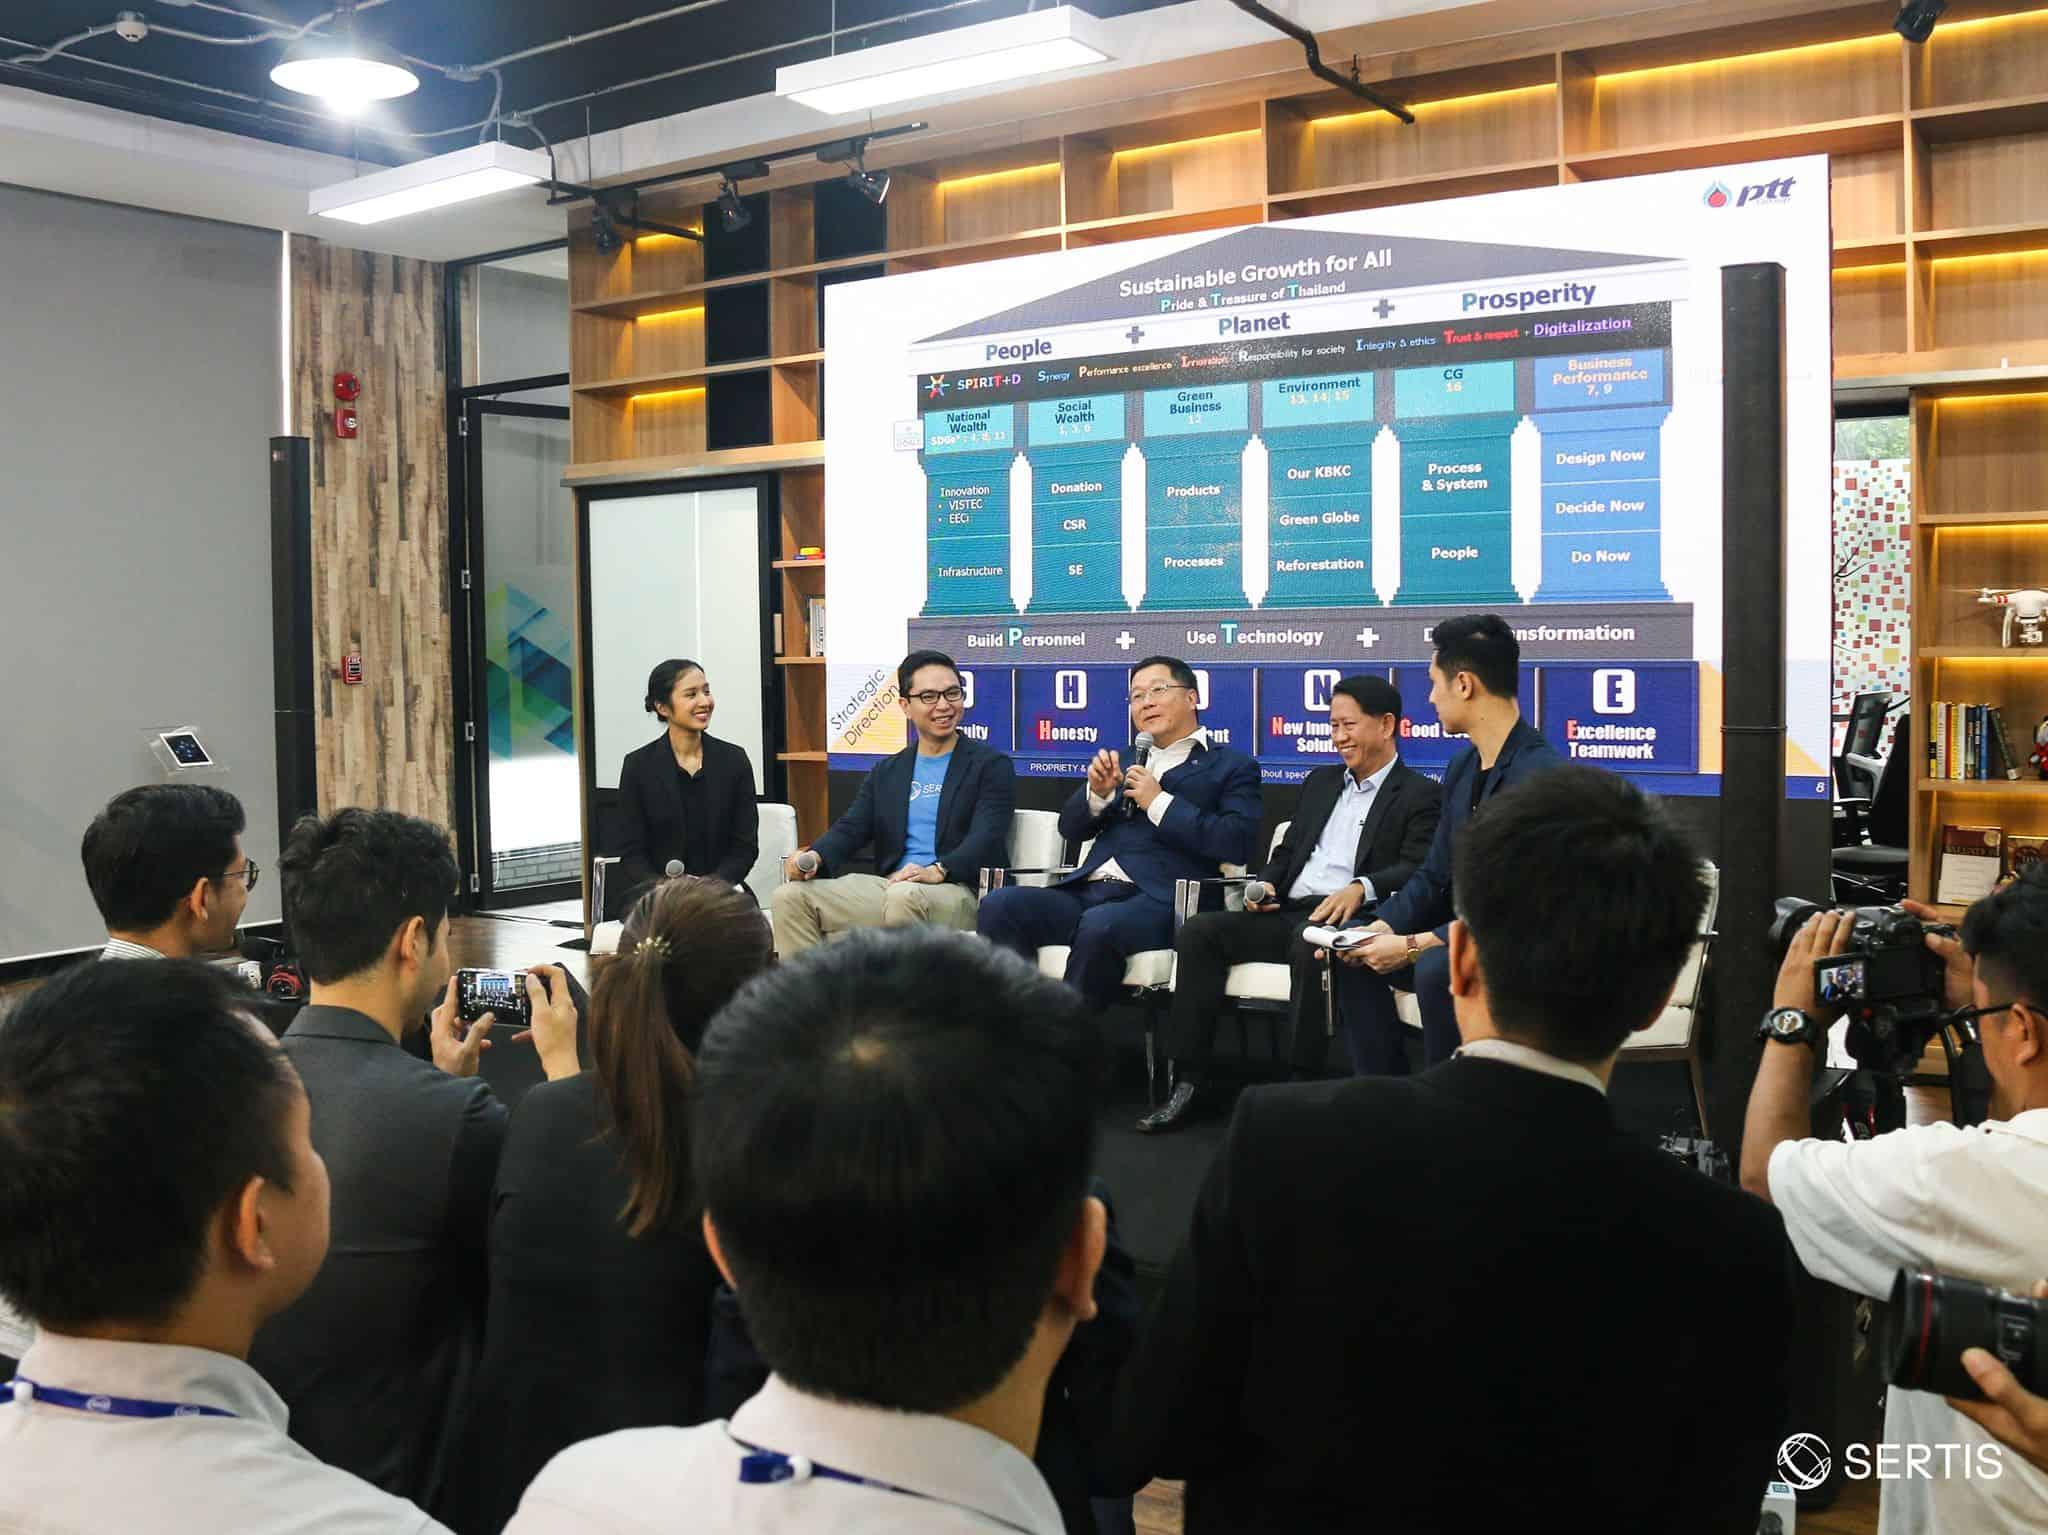 sertis data science ptt conference